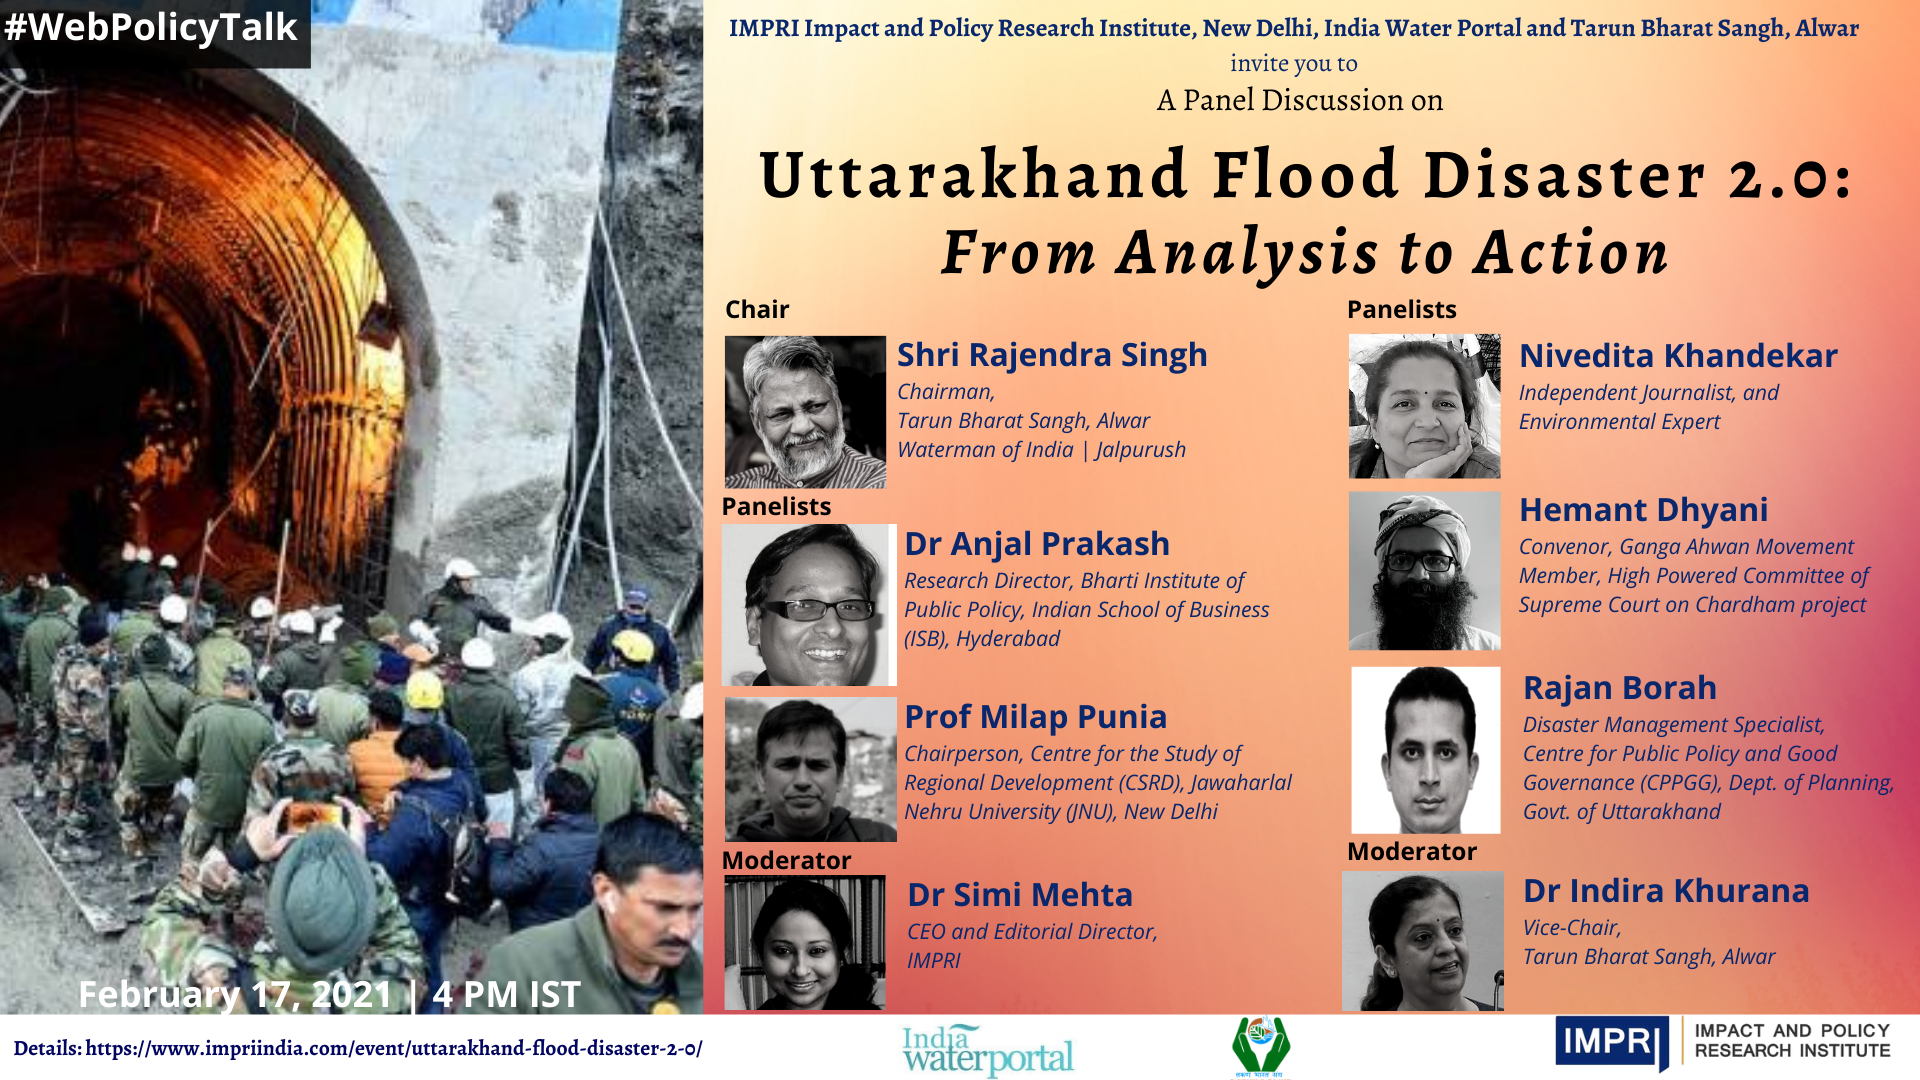 Uttarakhand Flood Disaster 2.0: From Analysis to Action